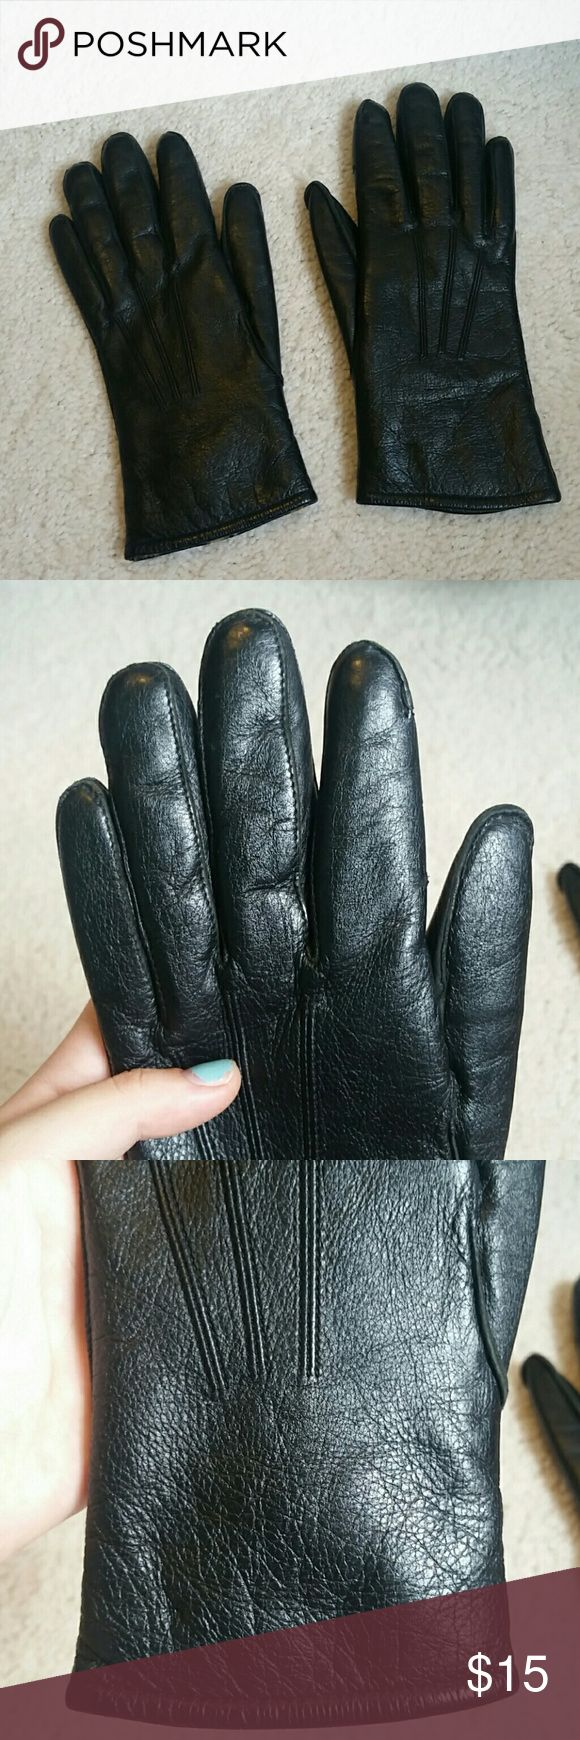 Black leather cut off gloves - Black Leather Gloves With Rabbit Fur Inside